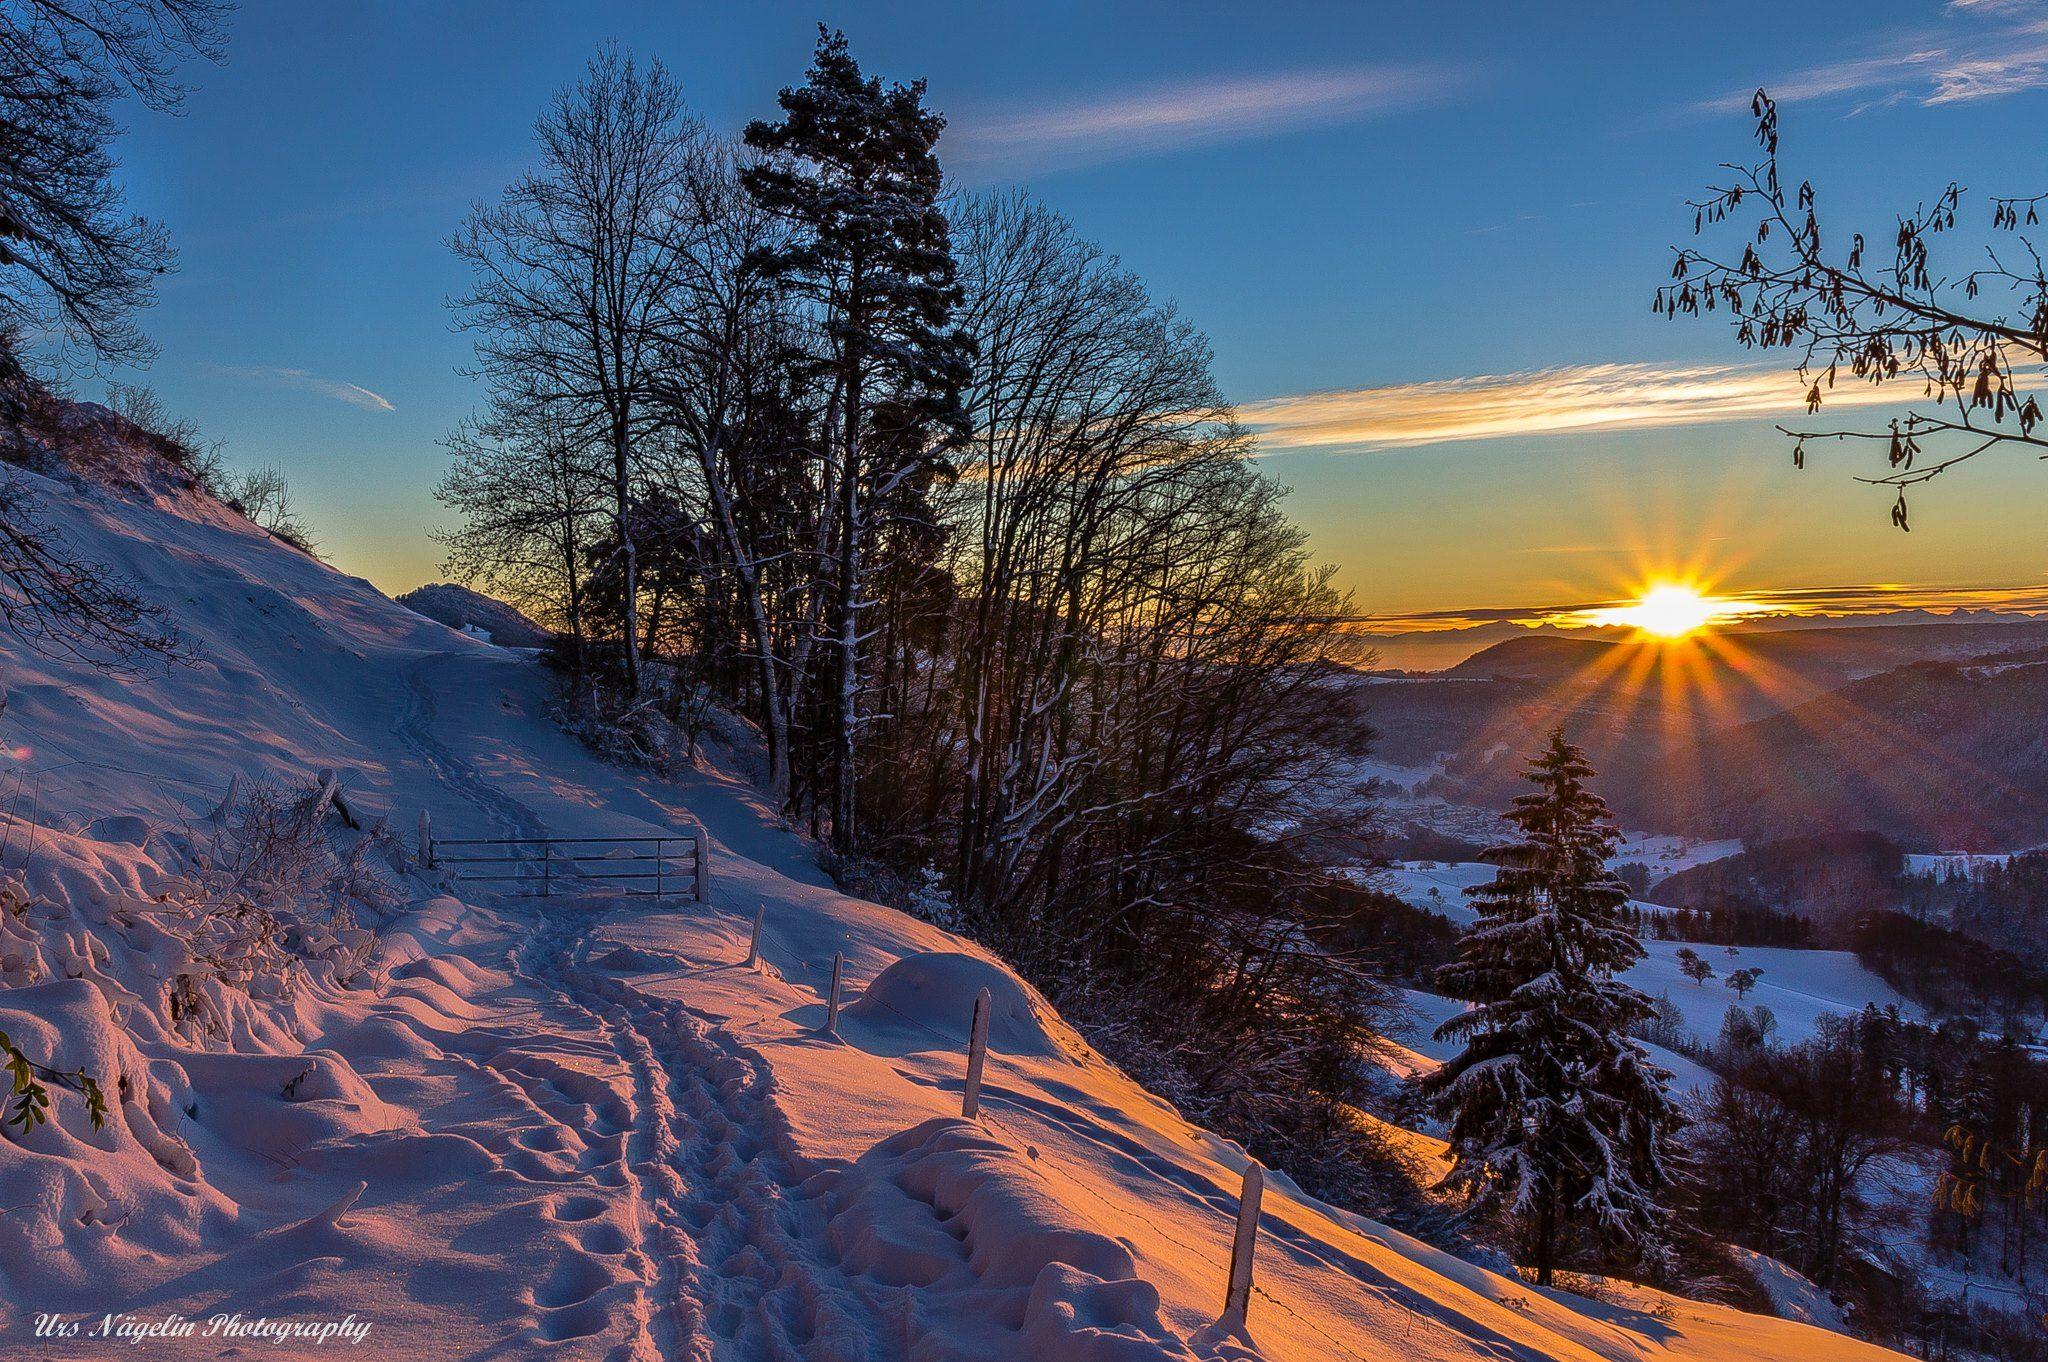 Passwang, Solothurn